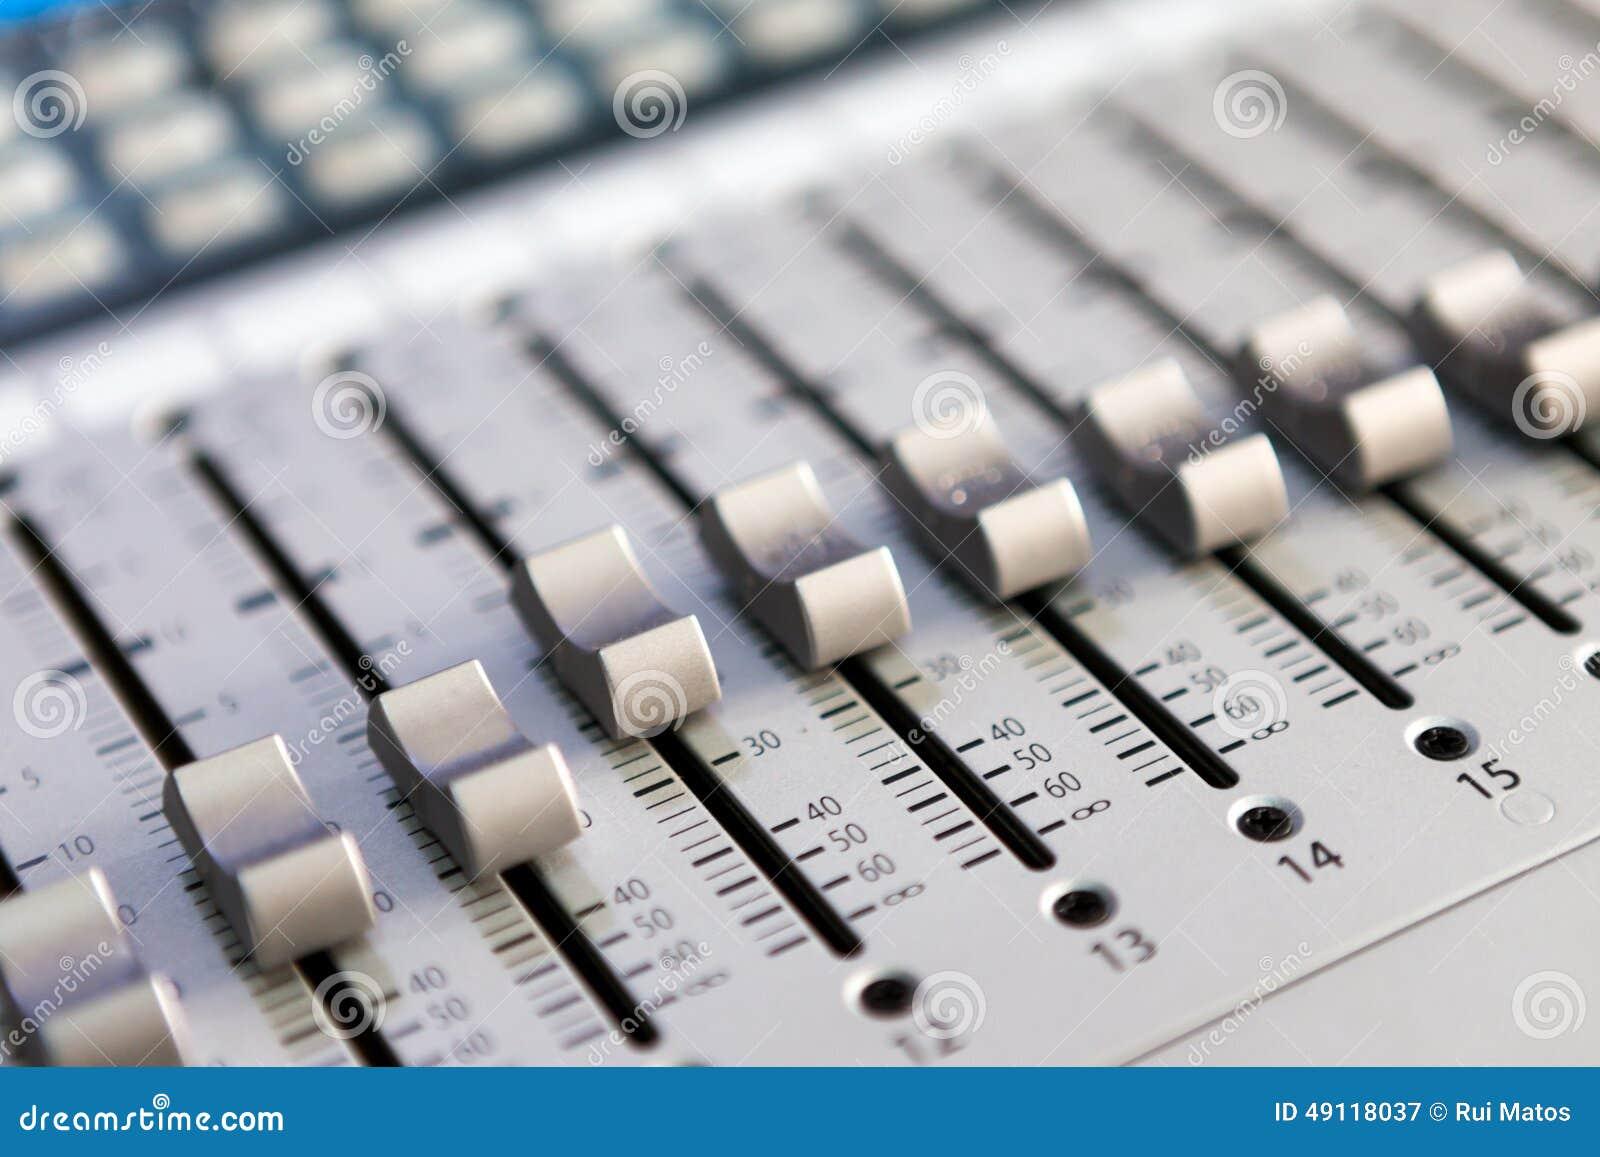 Download Multitrack Sound mixer stock image. Image of desktop - 49118037